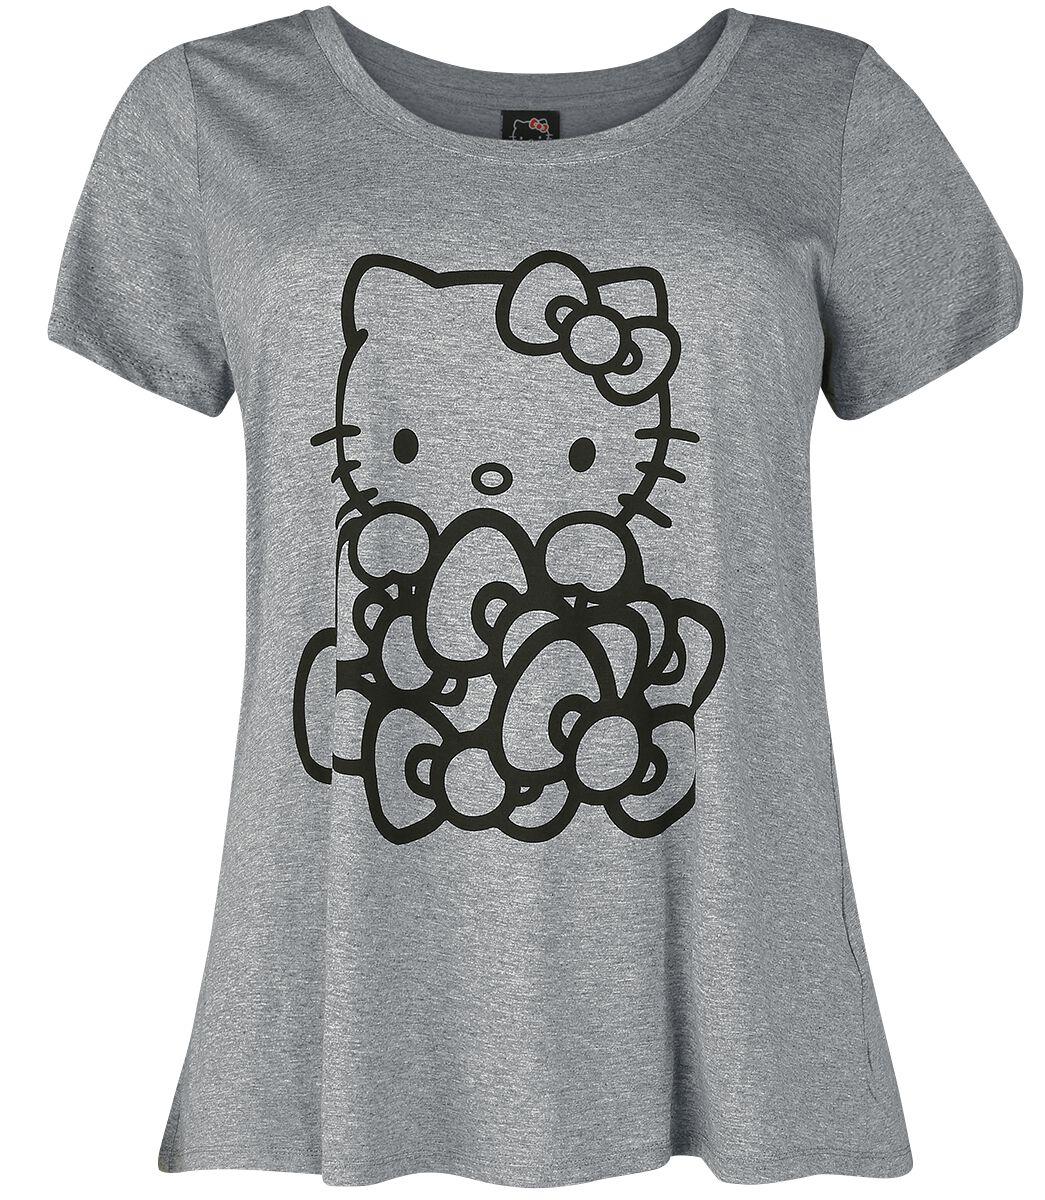 Merch dla Fanów - Koszulki - Koszulka damska Hello Kitty Pile Of Bows Koszulka damska odcienie szarego - 351137